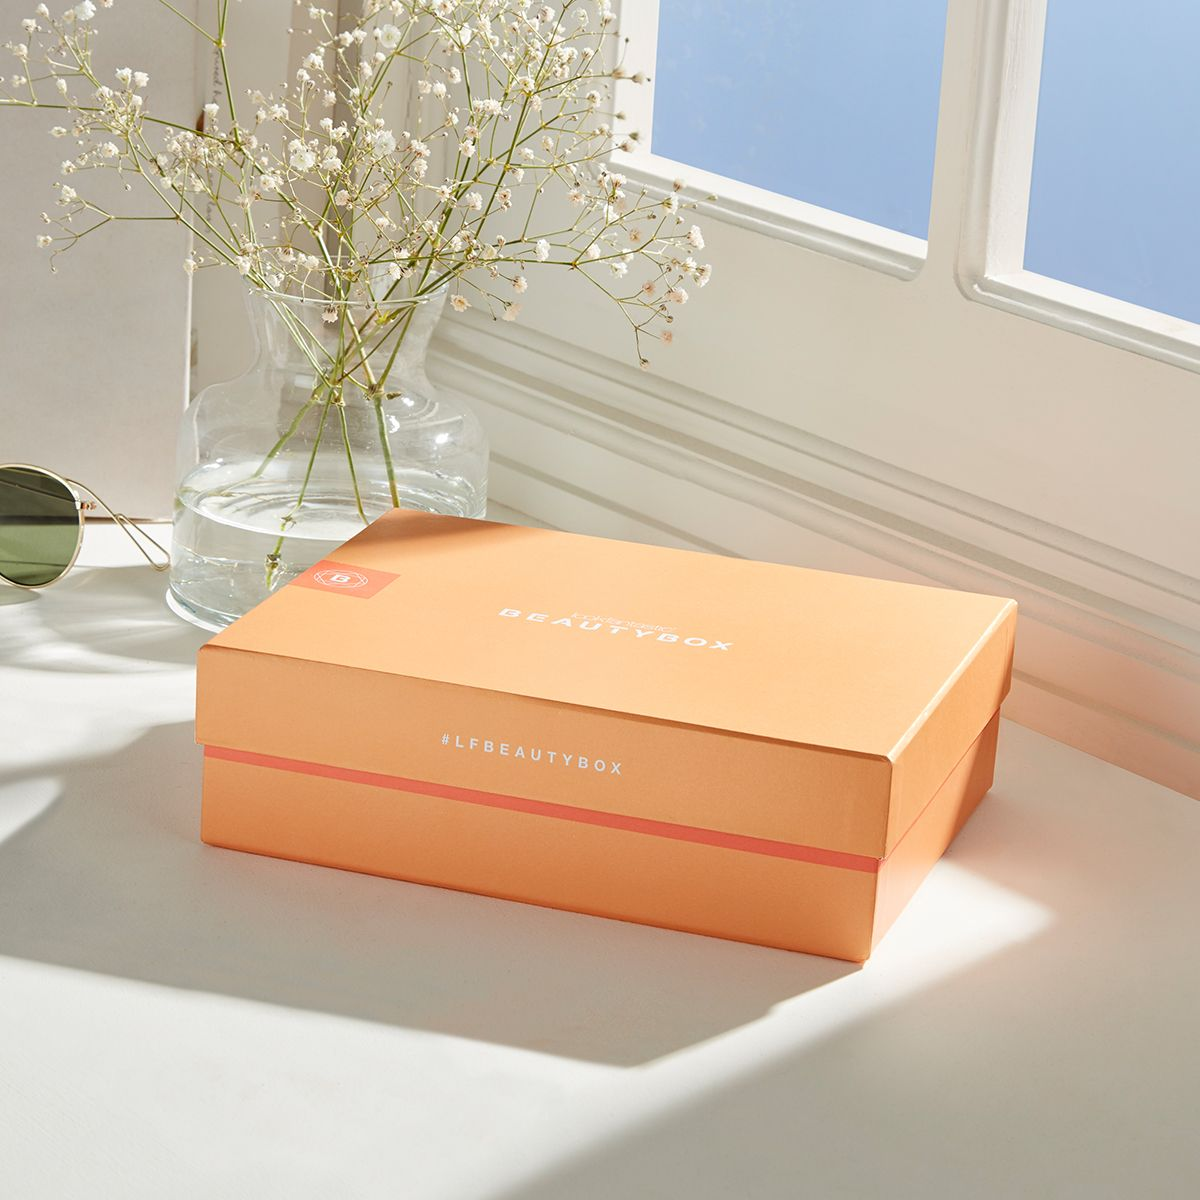 LOOKFANTASTIC Beauty Box: How it works